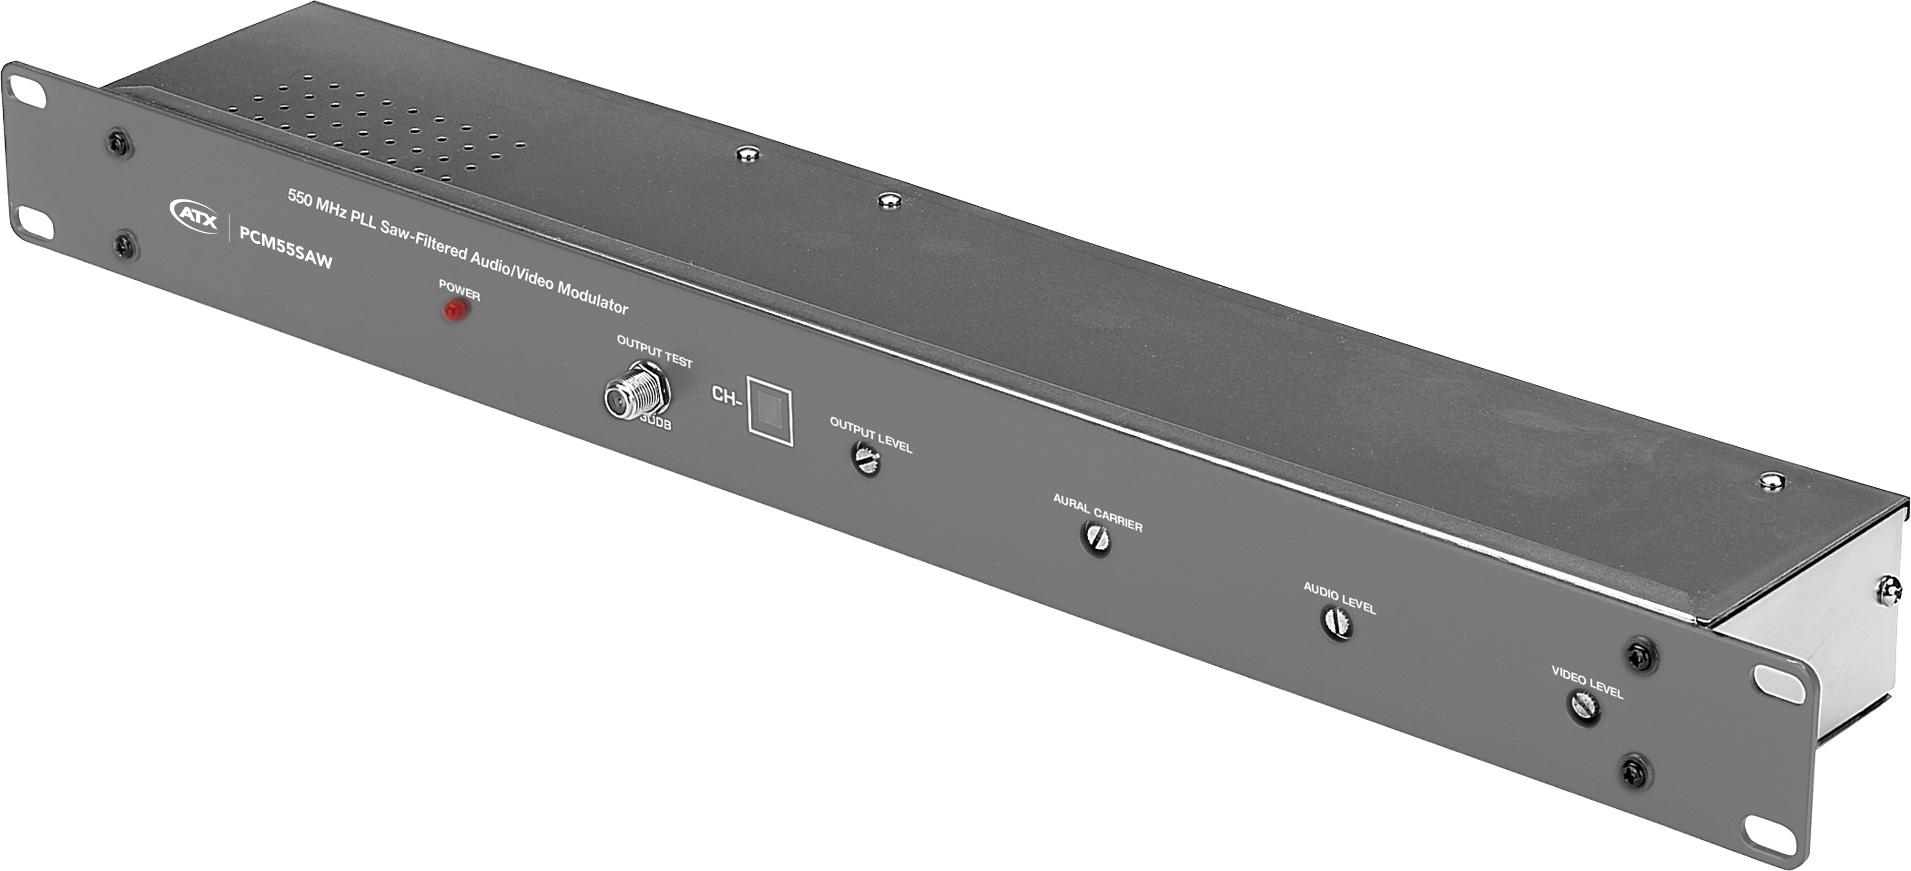 1 Channel Crystal A/V Modulator - Channel 28 PM-PCM55SAW-28